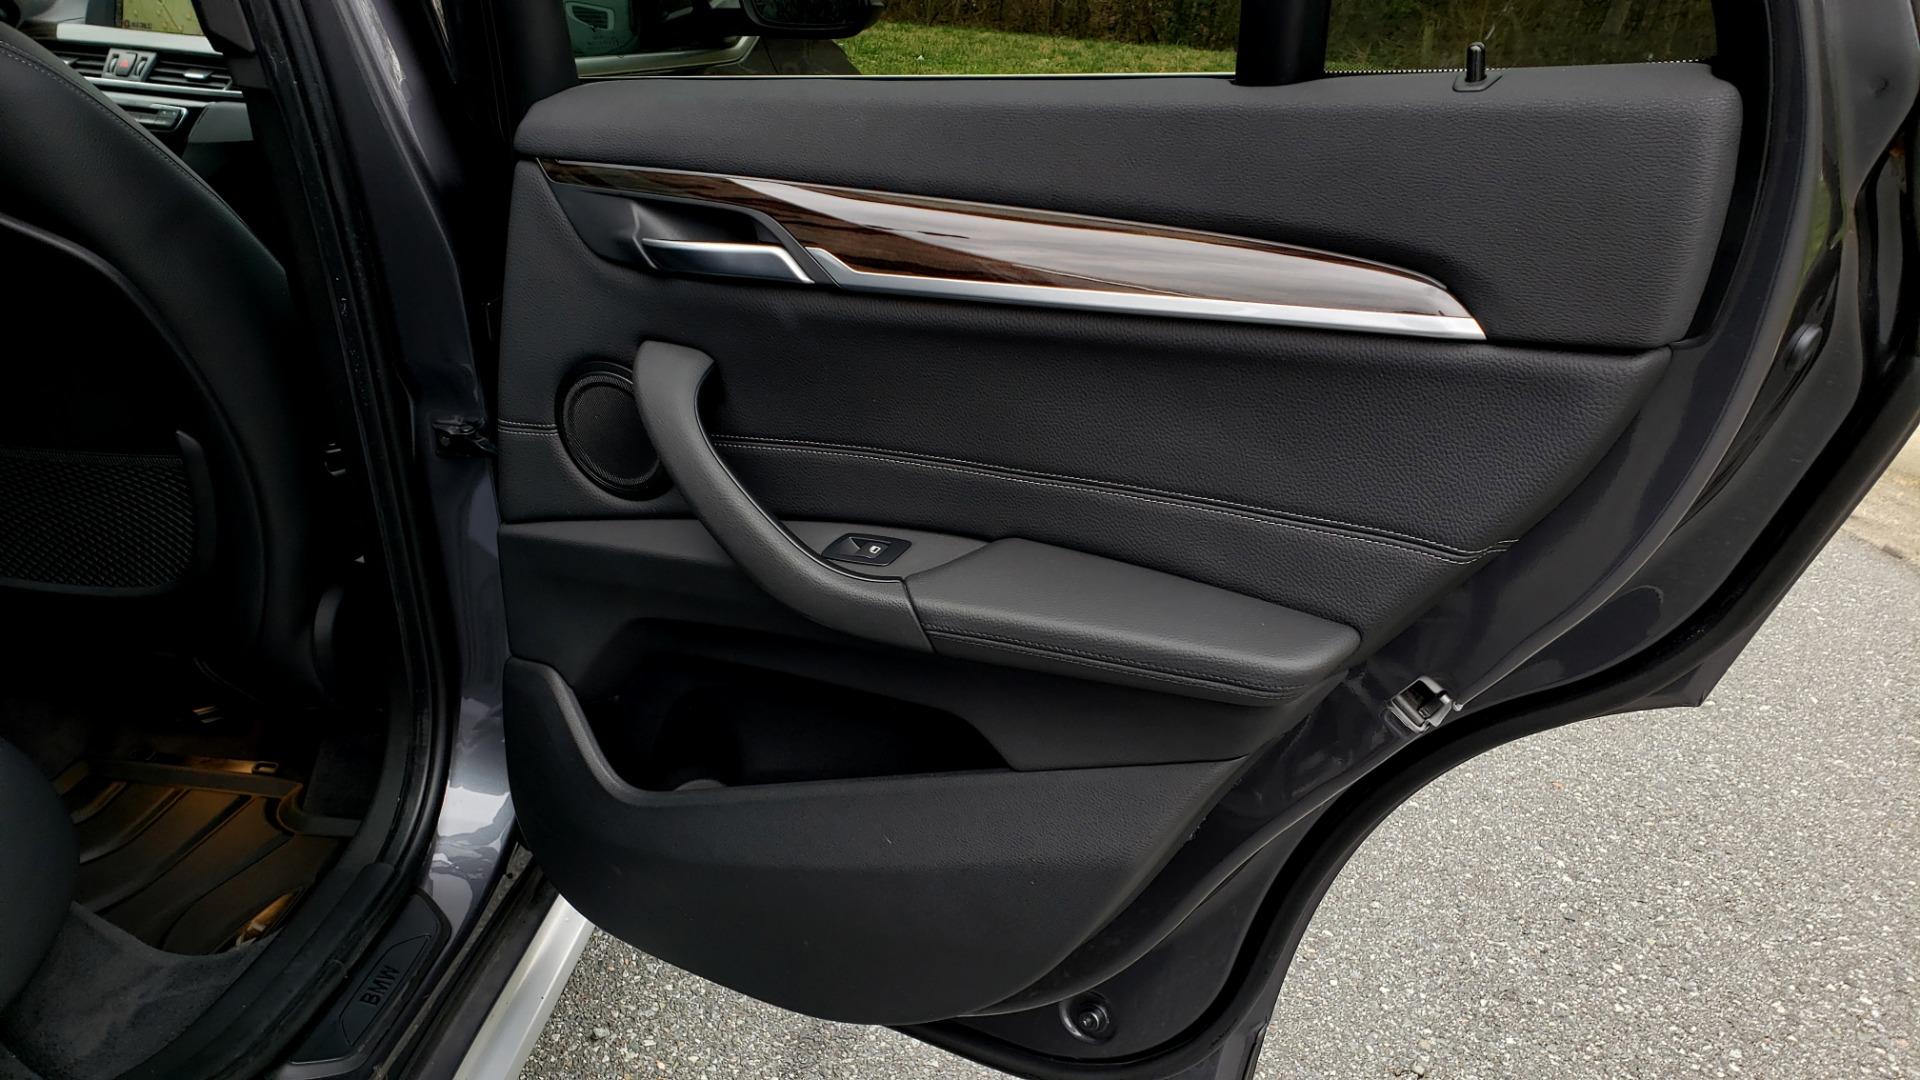 Used 2017 BMW X1 XDRIVE28I / PREM PKG / DRIVER ASST / NAV / CLD WTHR for sale Sold at Formula Imports in Charlotte NC 28227 73